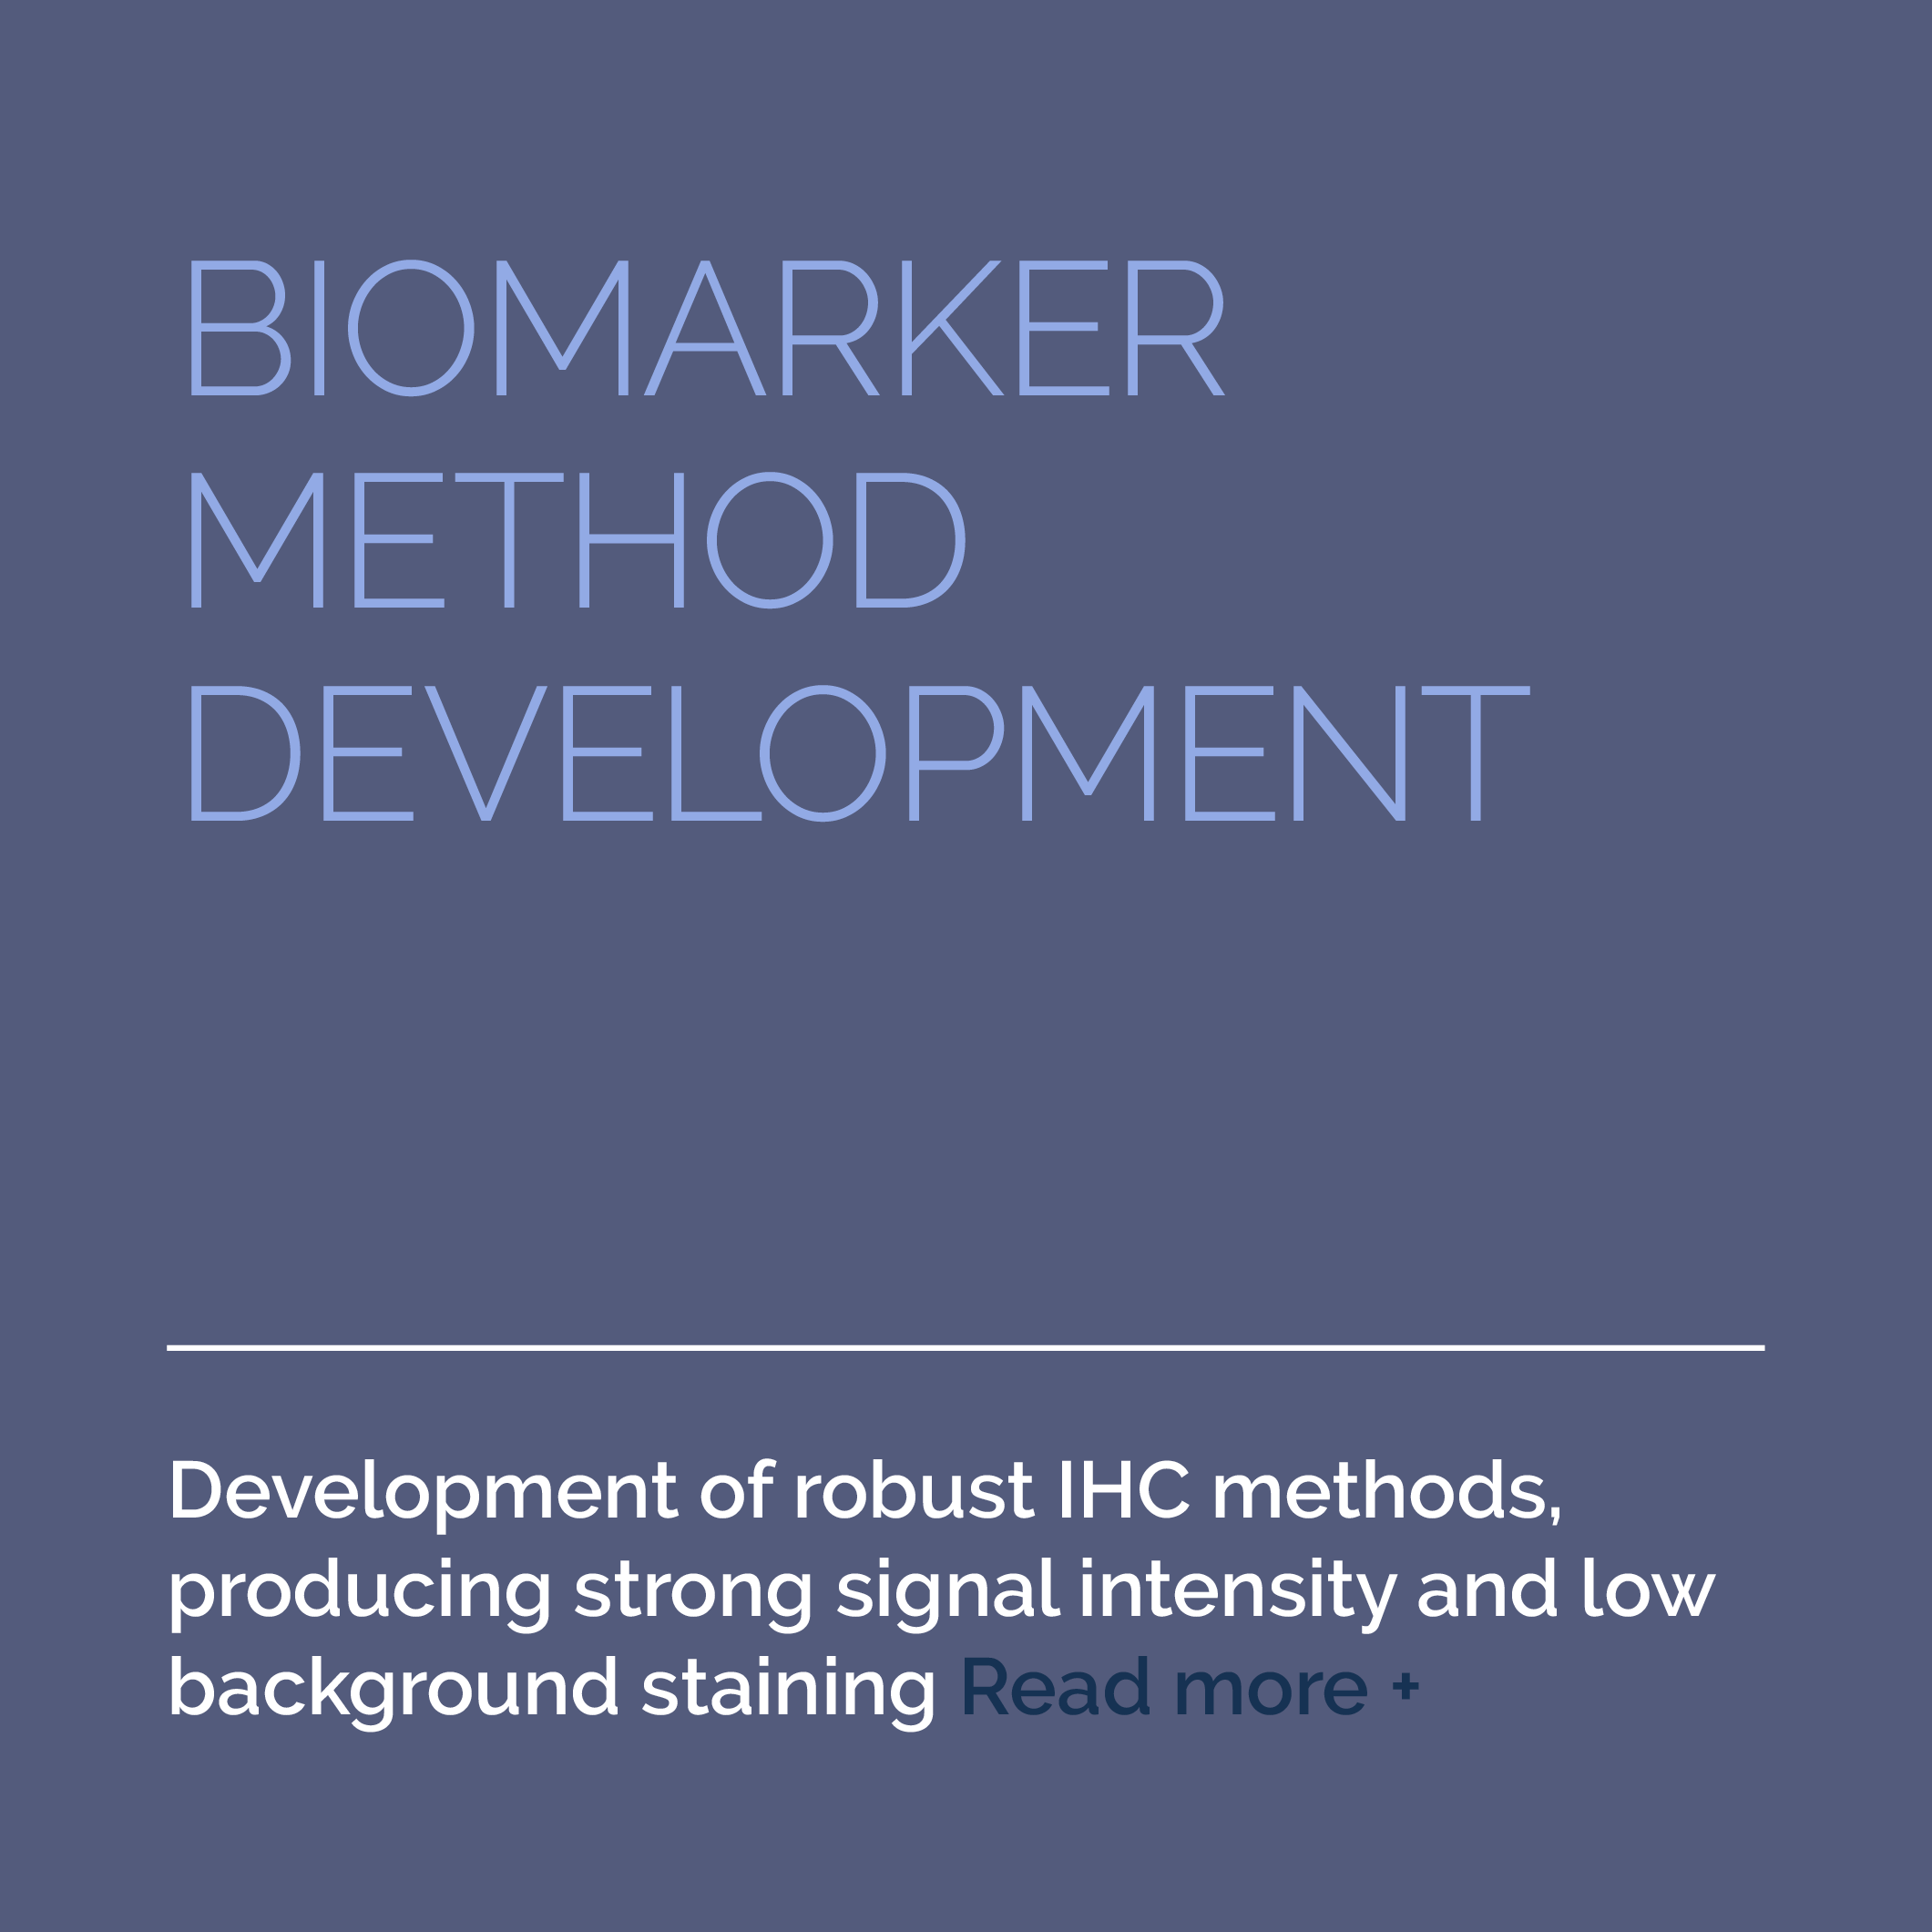 2-Services-Biomarker-Development-AFTER.png